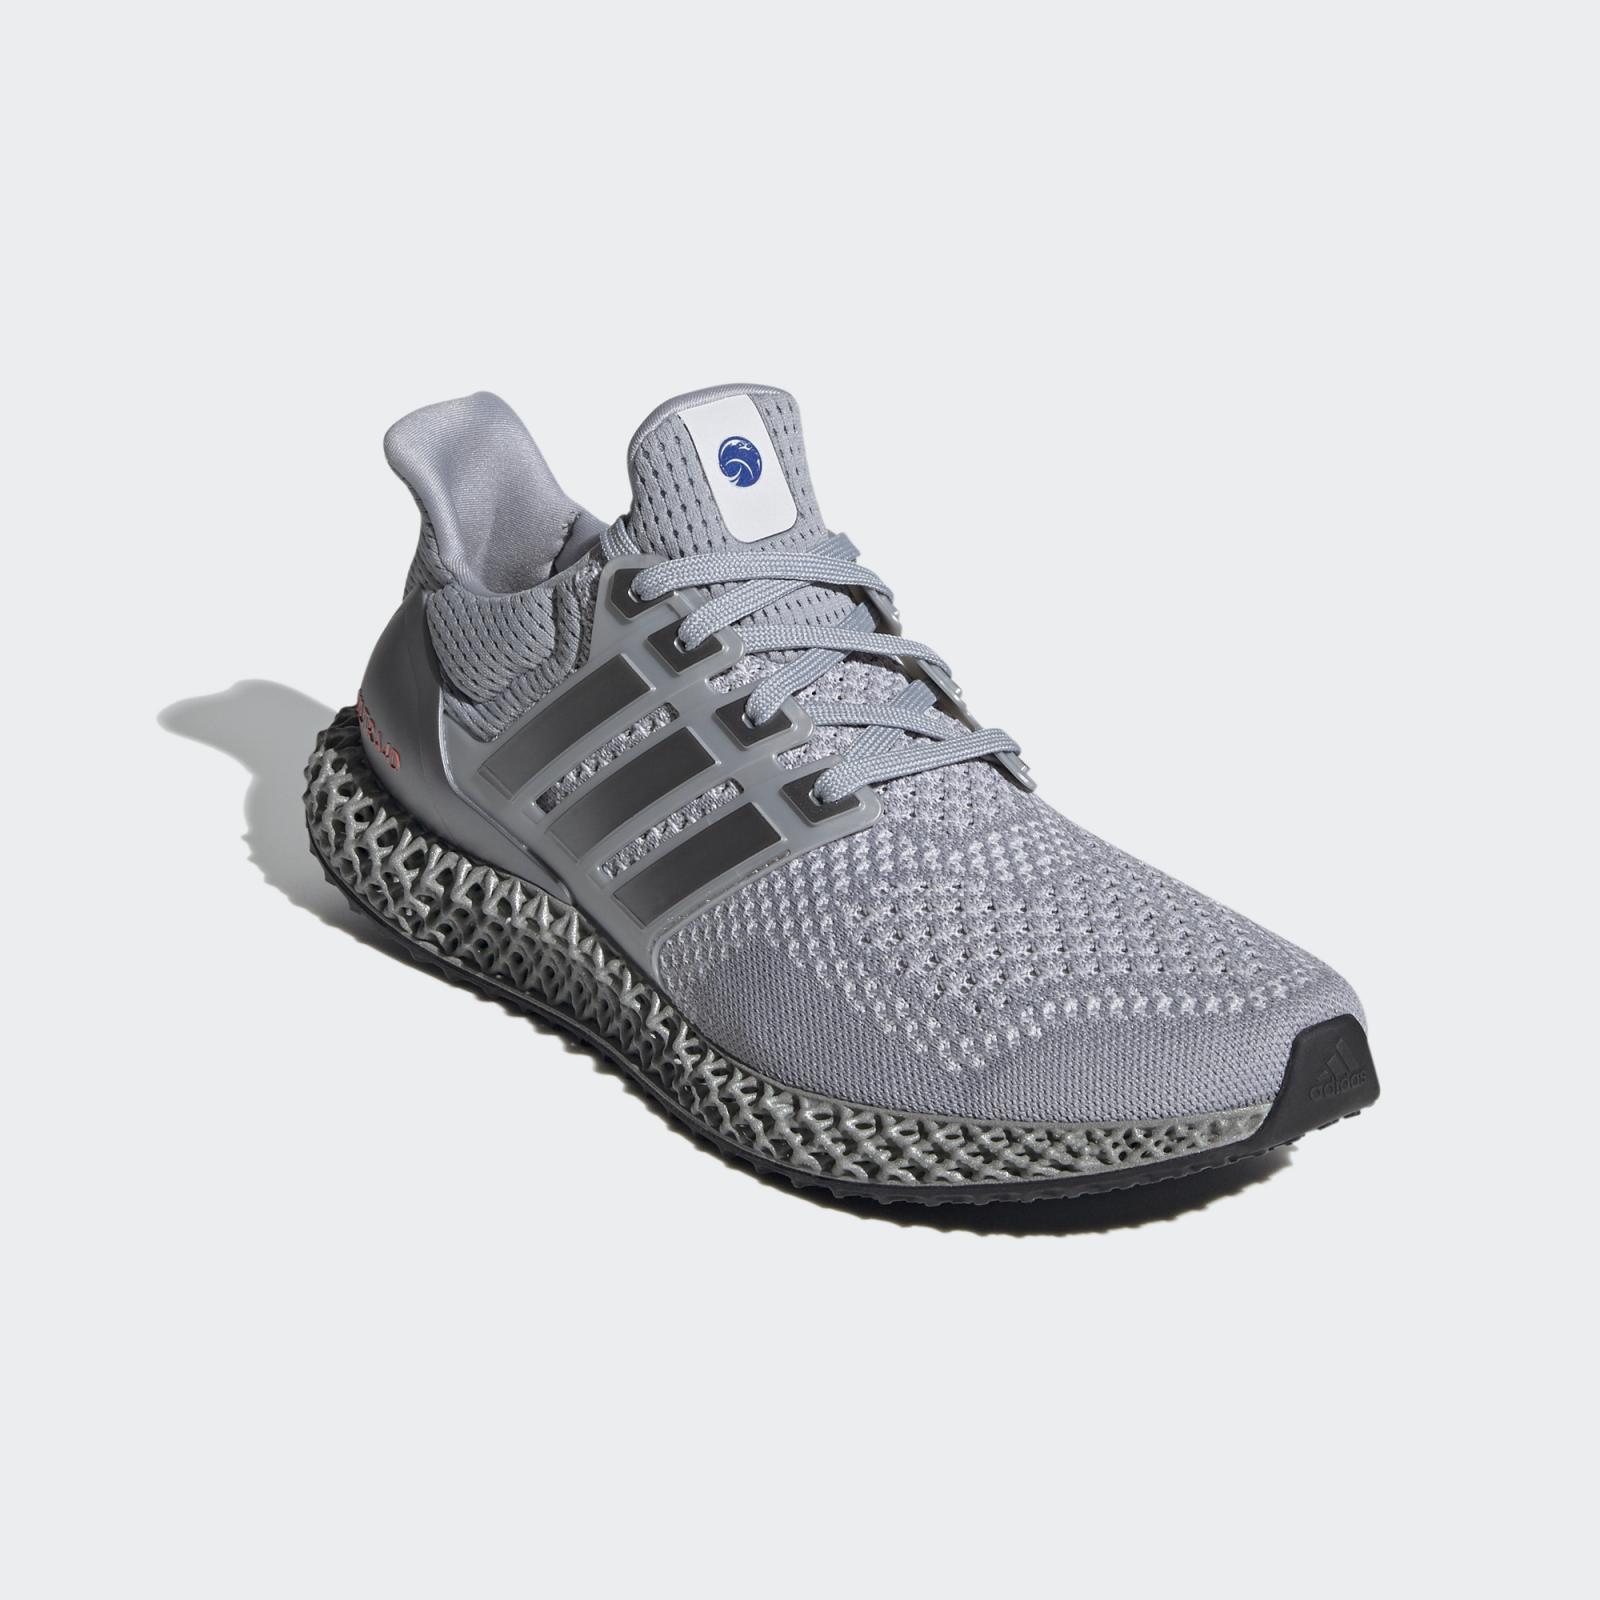 adidas Running发布全新银/红荧光色Ultra 4D